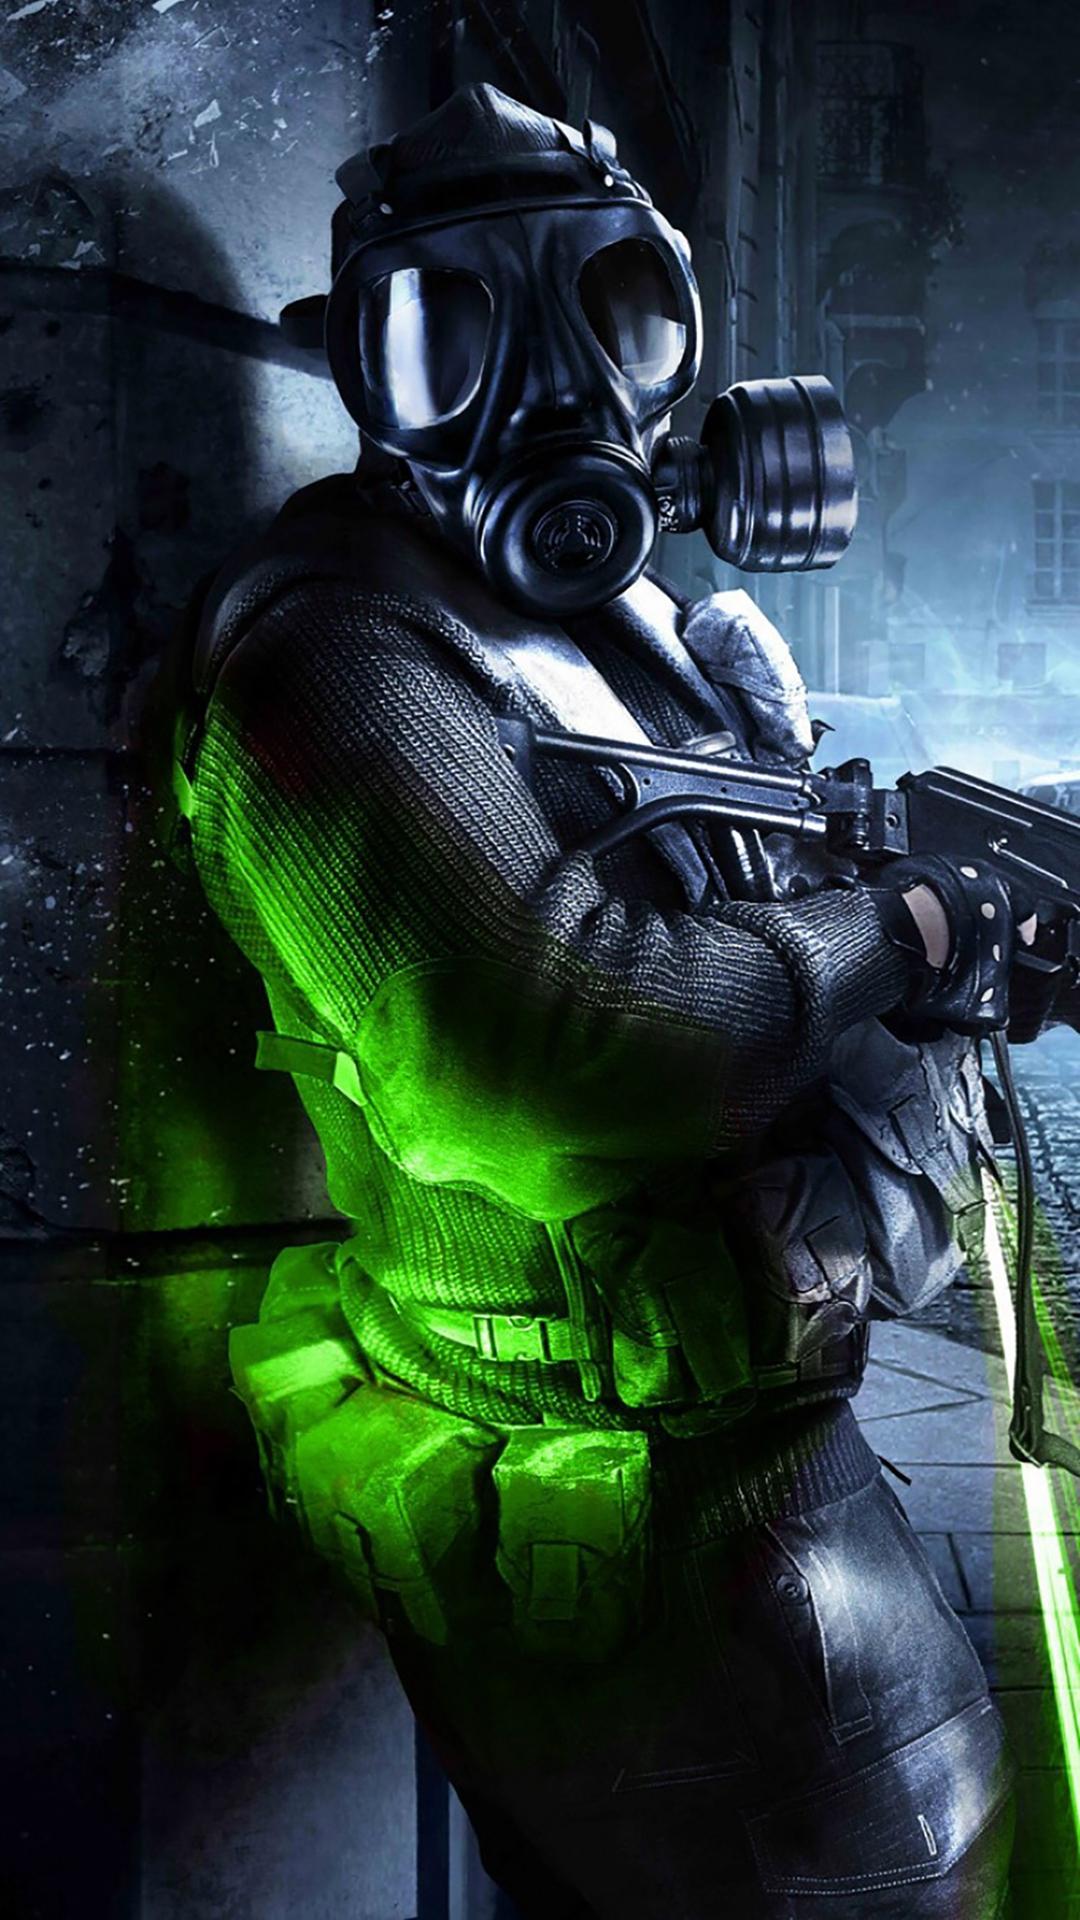 Best 41 Call iPhone Background on HipWallpaper Xbox Wallpaper 1080x1920